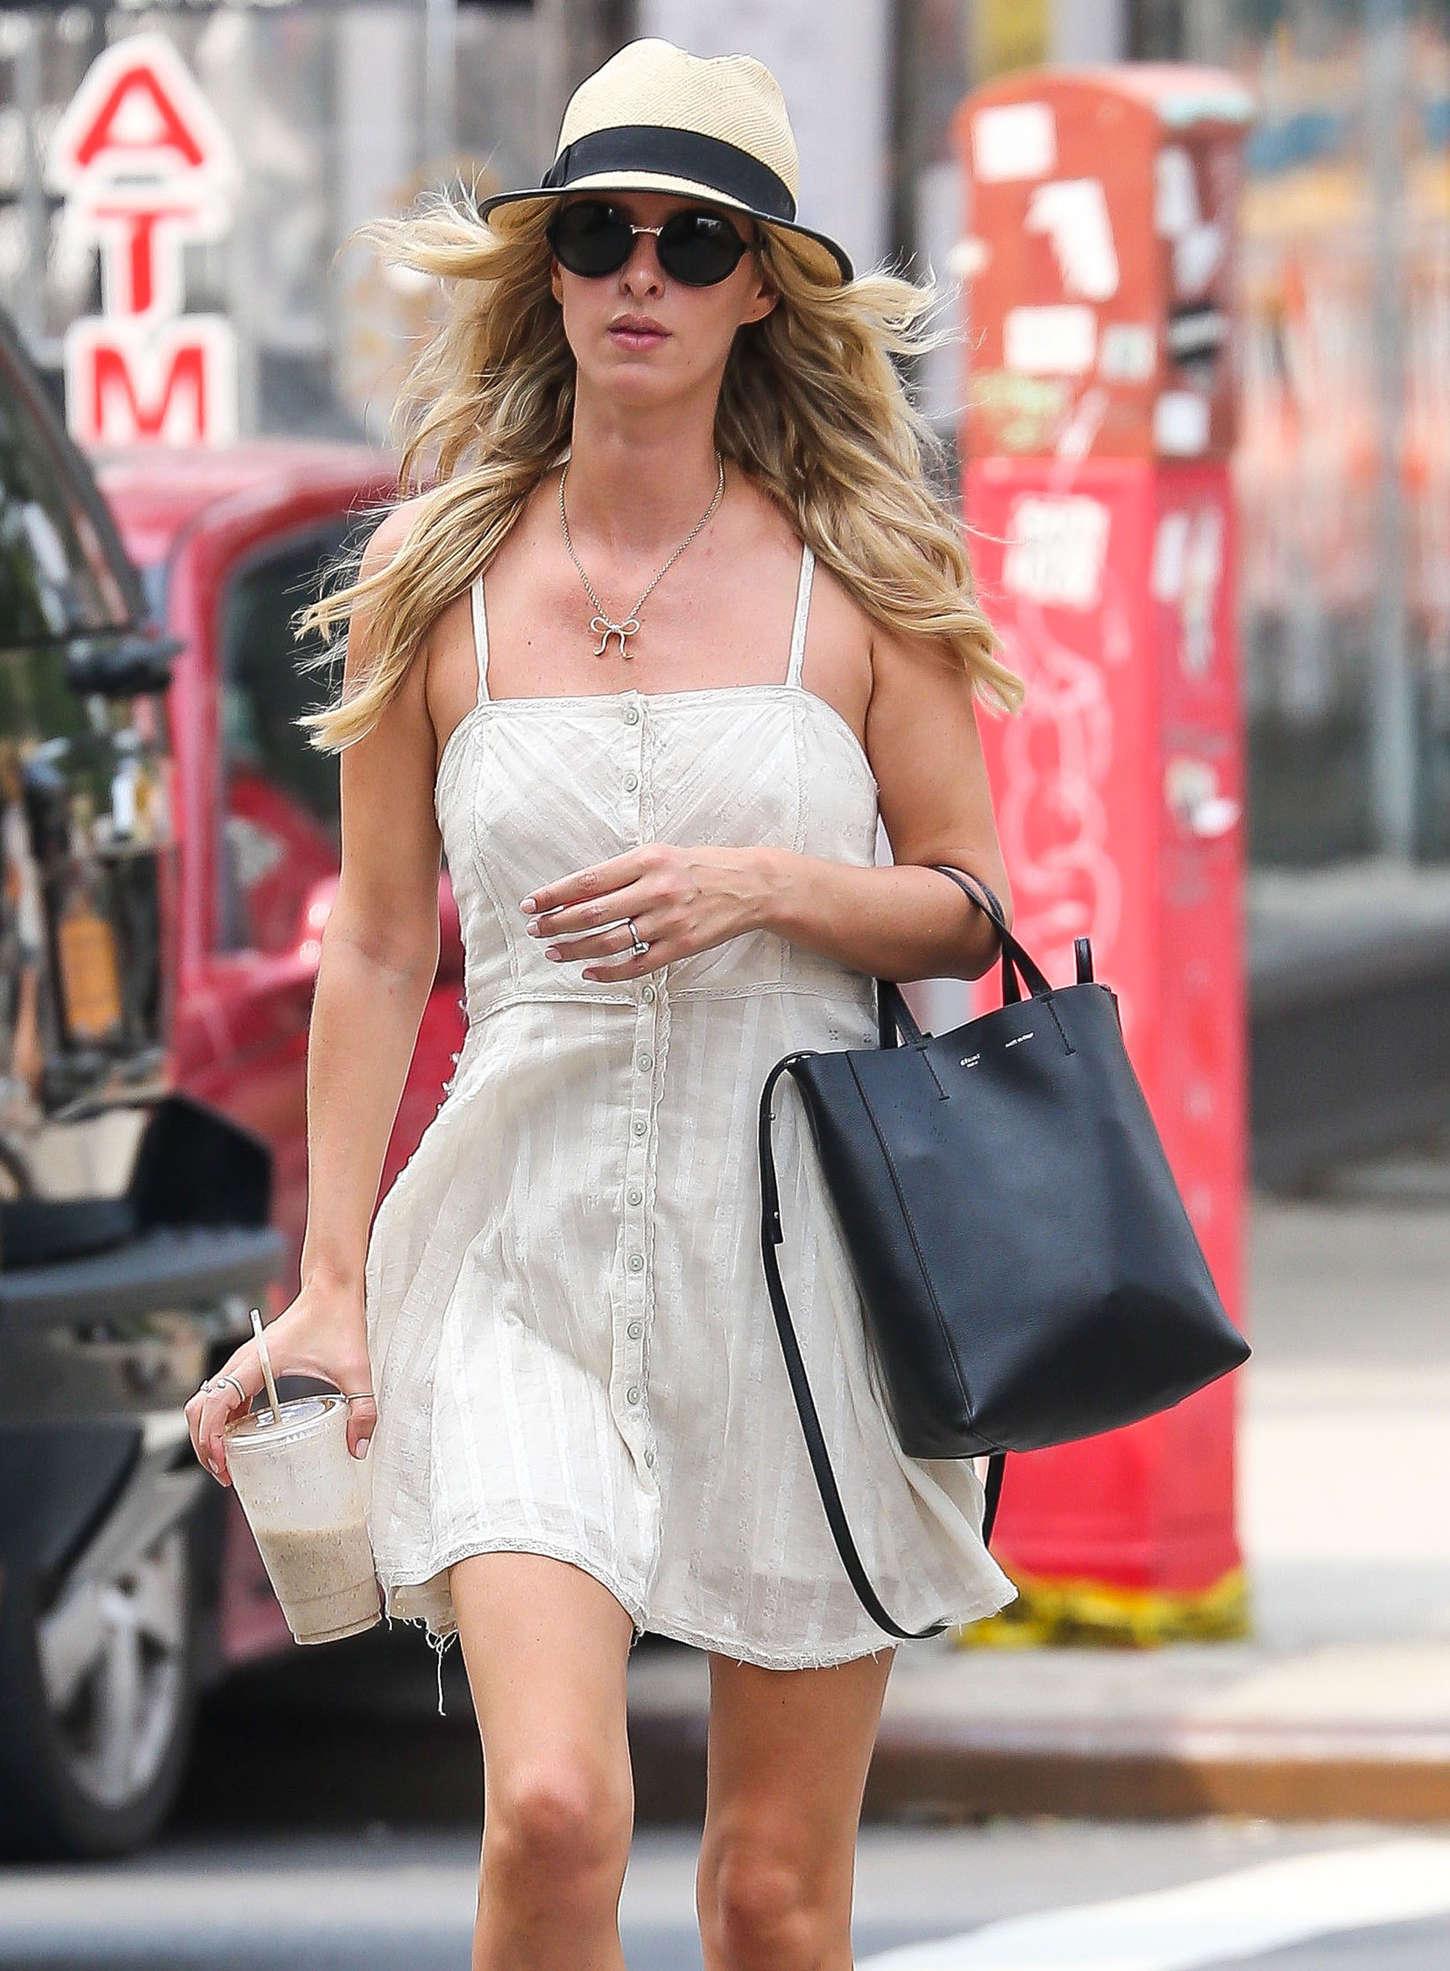 Nicky Hilton in Short Dresss Shopping in New York